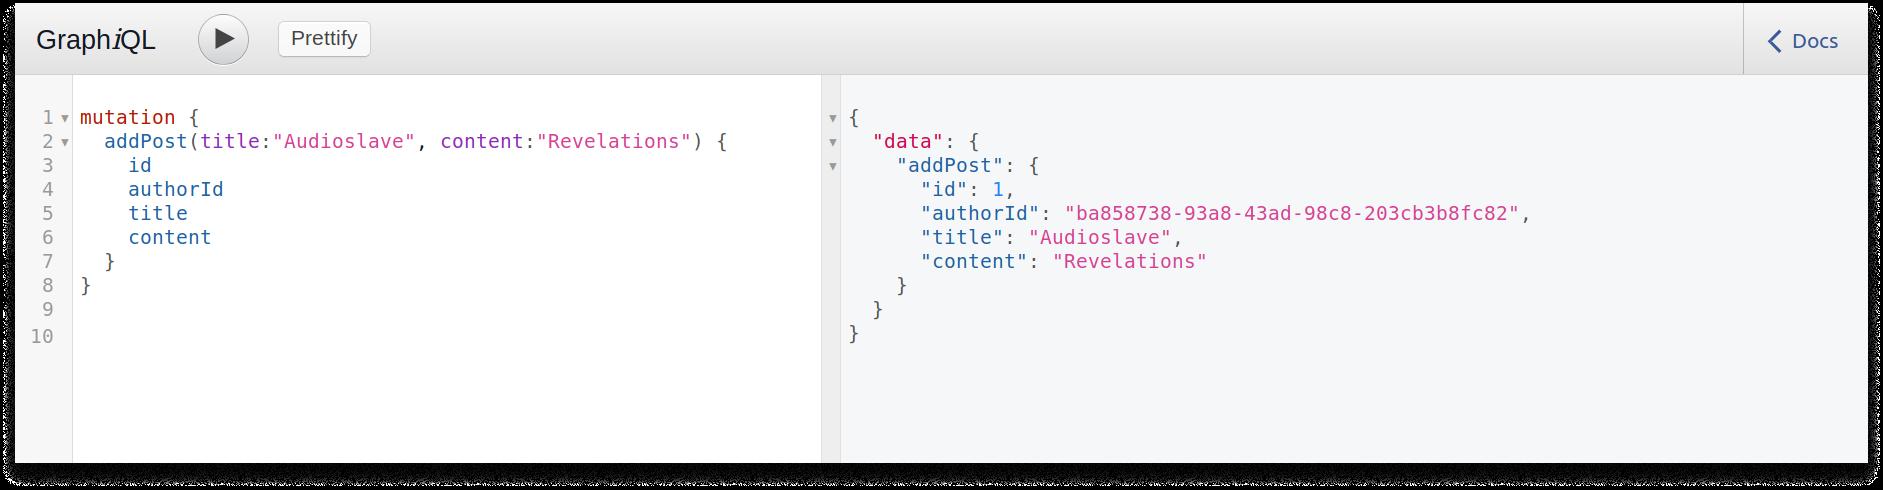 GraphQL query to add a post in a Scala GraphQL application